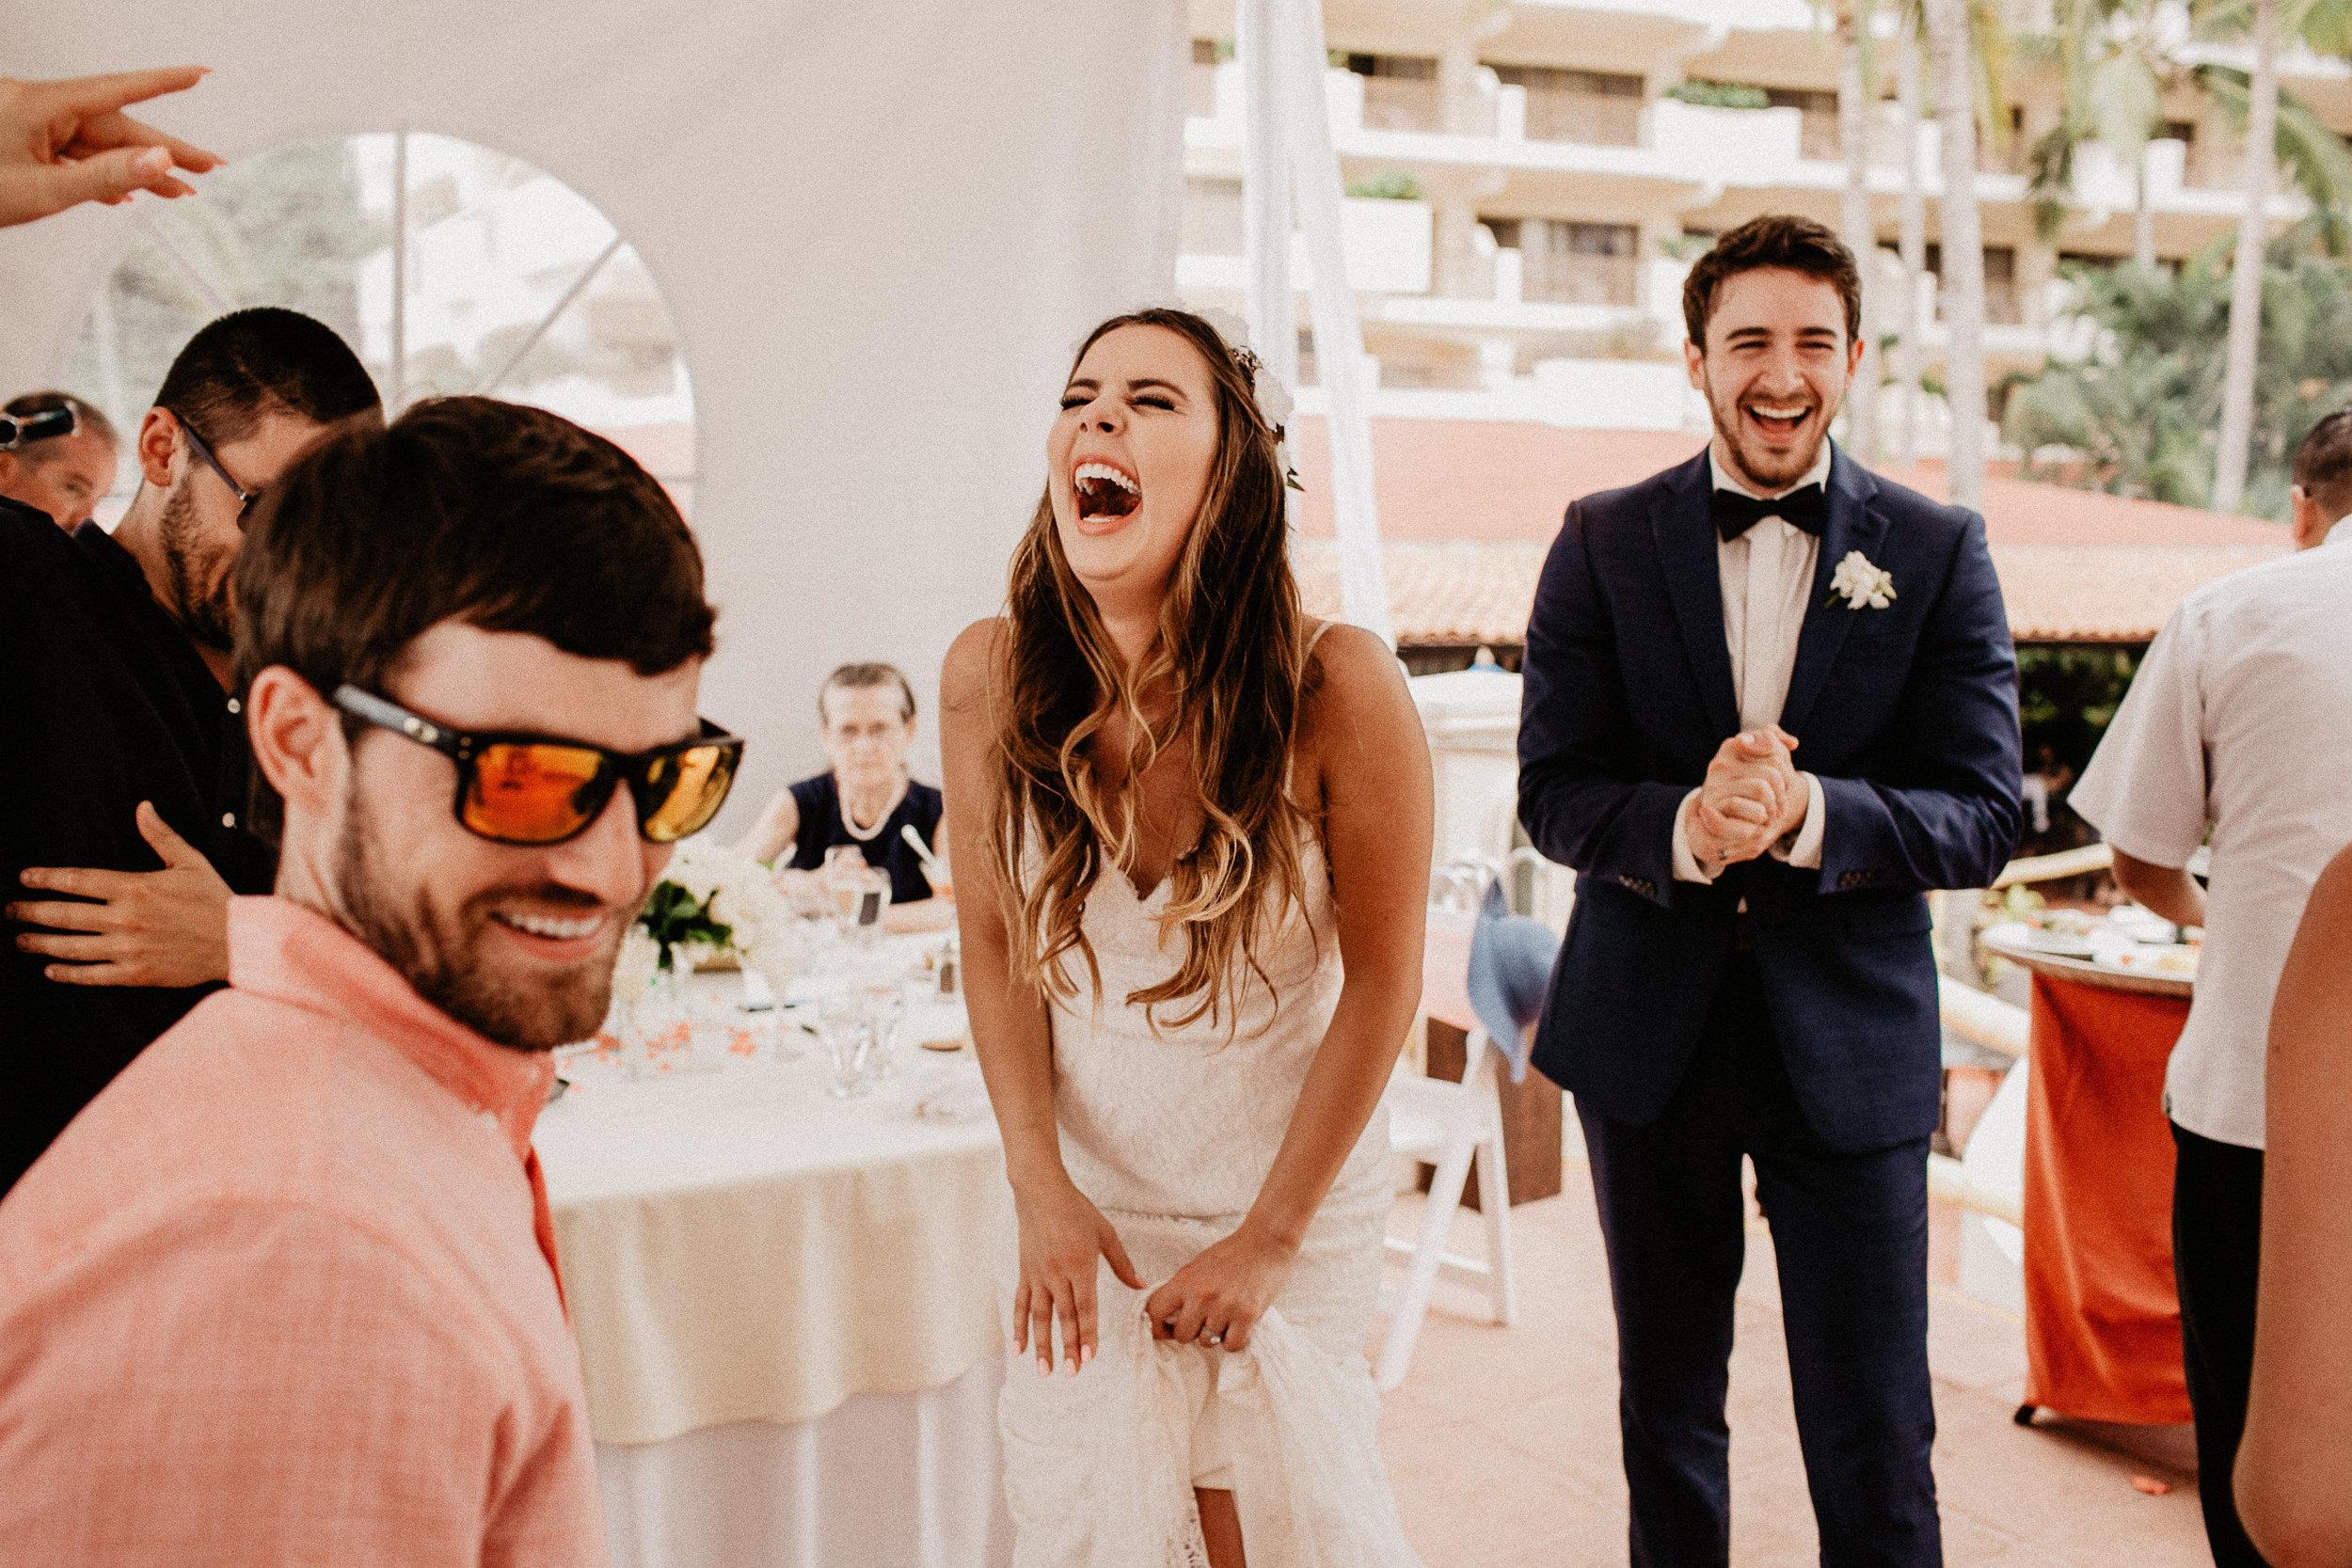 alfonso_flores_destination_wedding_photography_puerto_vallarta_hotel_barcelo_vallarta_cuttler_amela-536.JPG